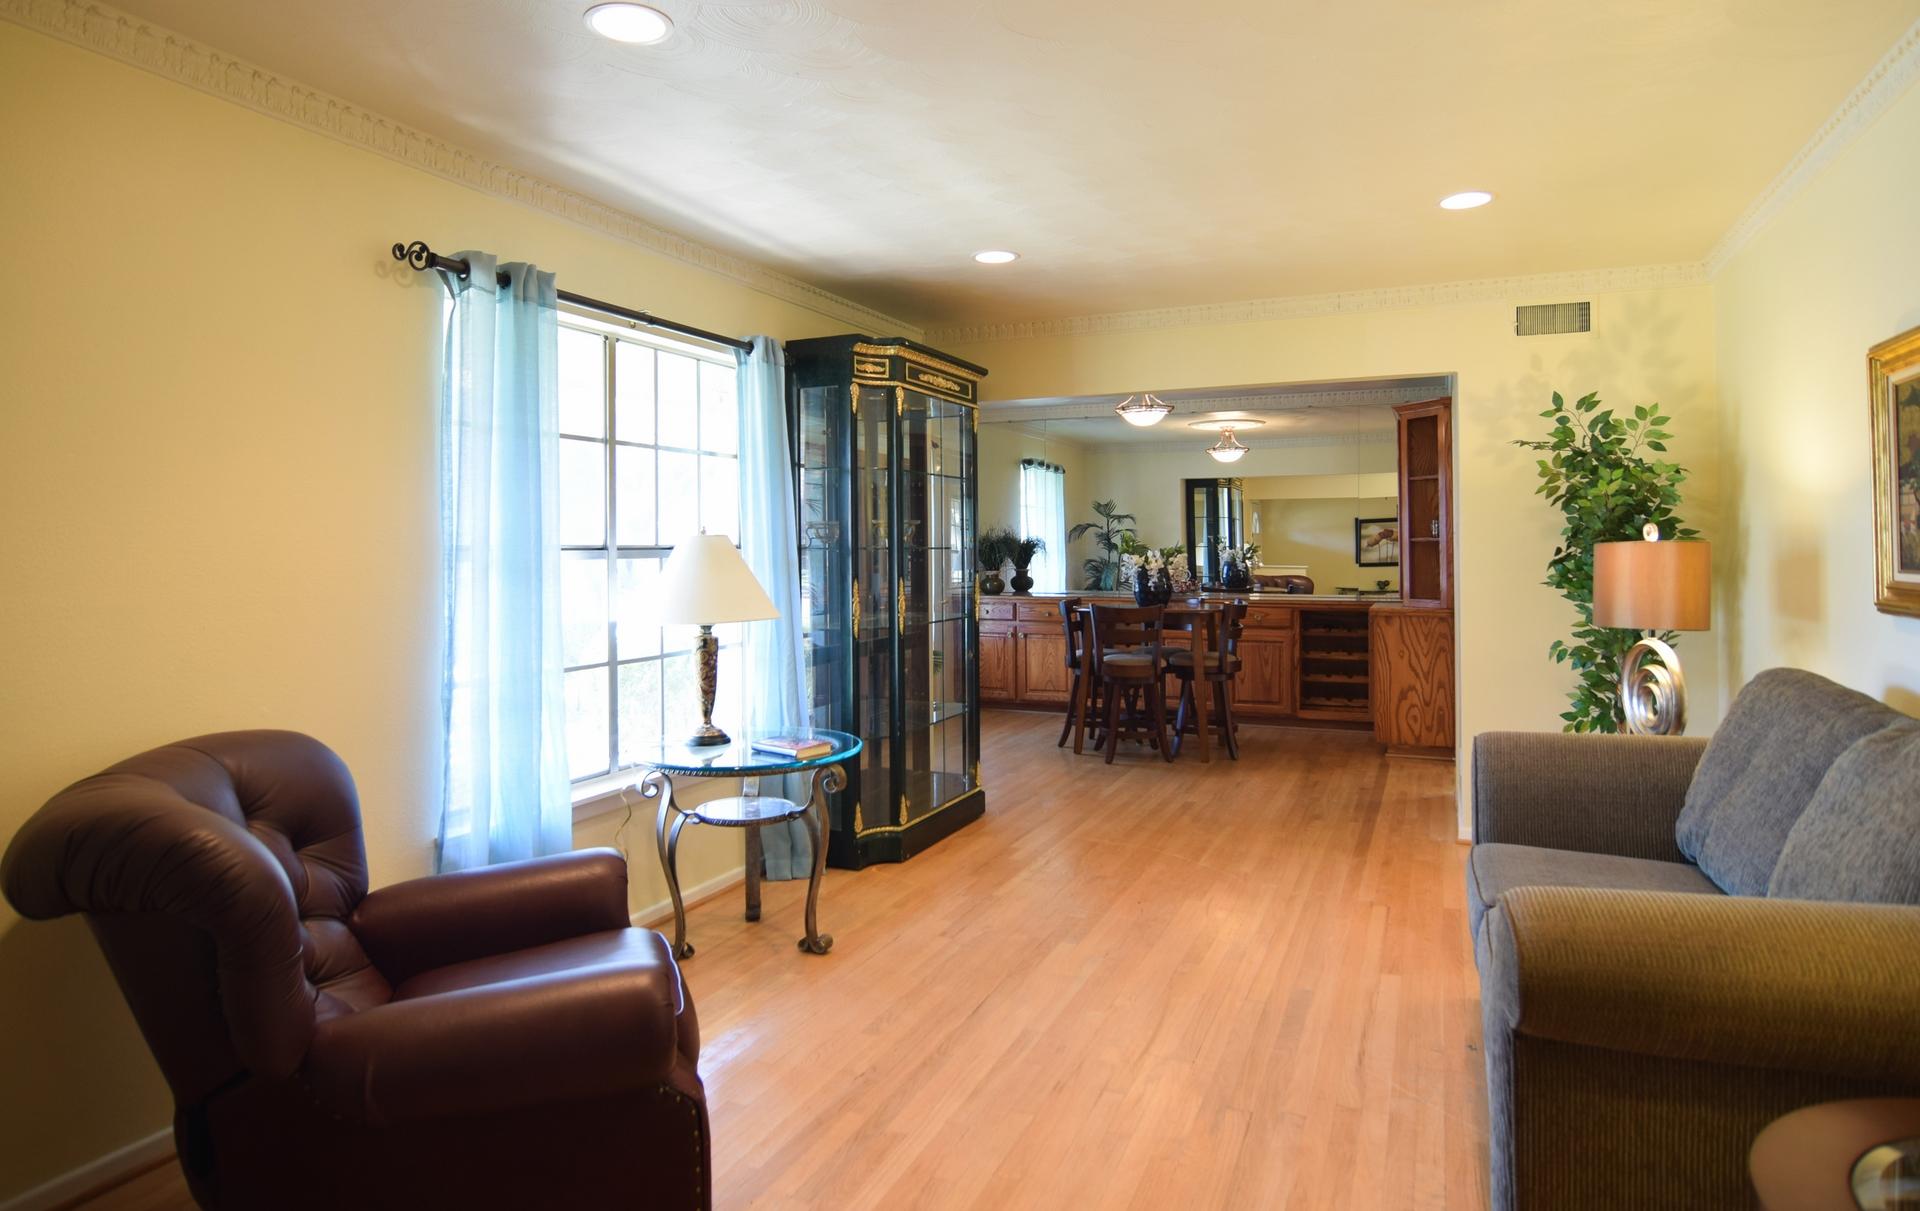 Living Room 3235 Timberview Rd Dallas TX 75229.jpg